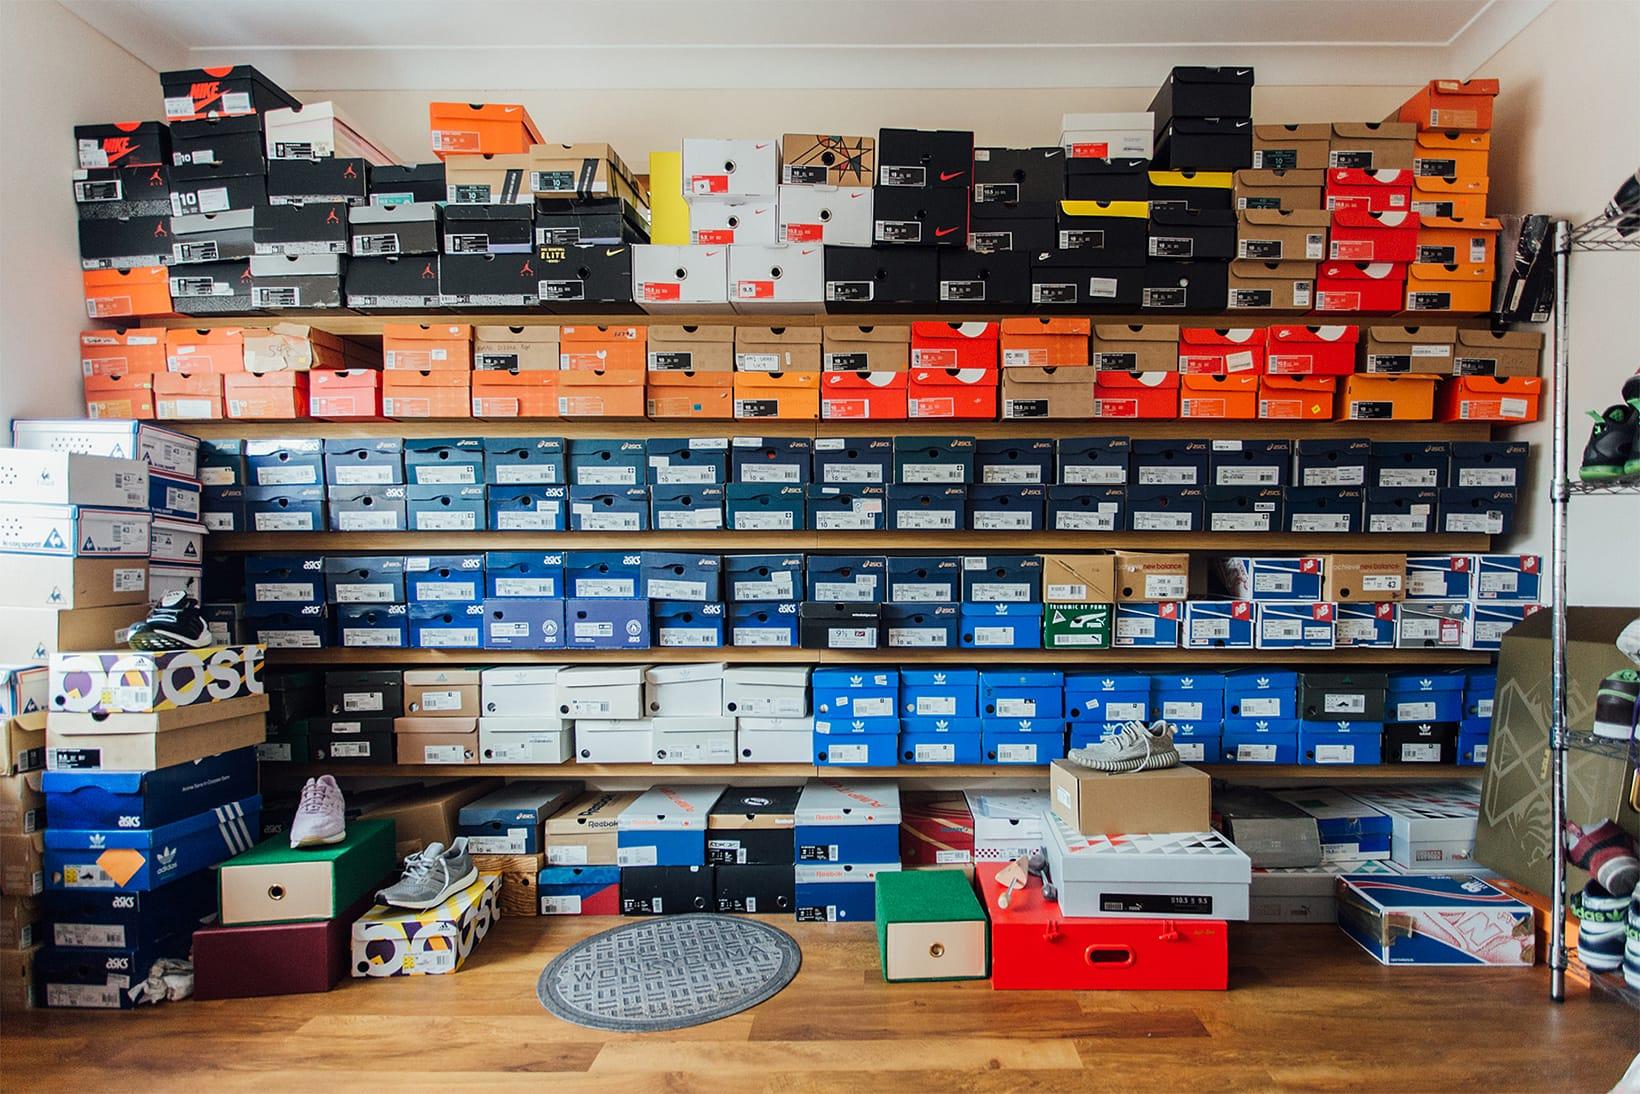 OG Sneakerheads Are Selling Their